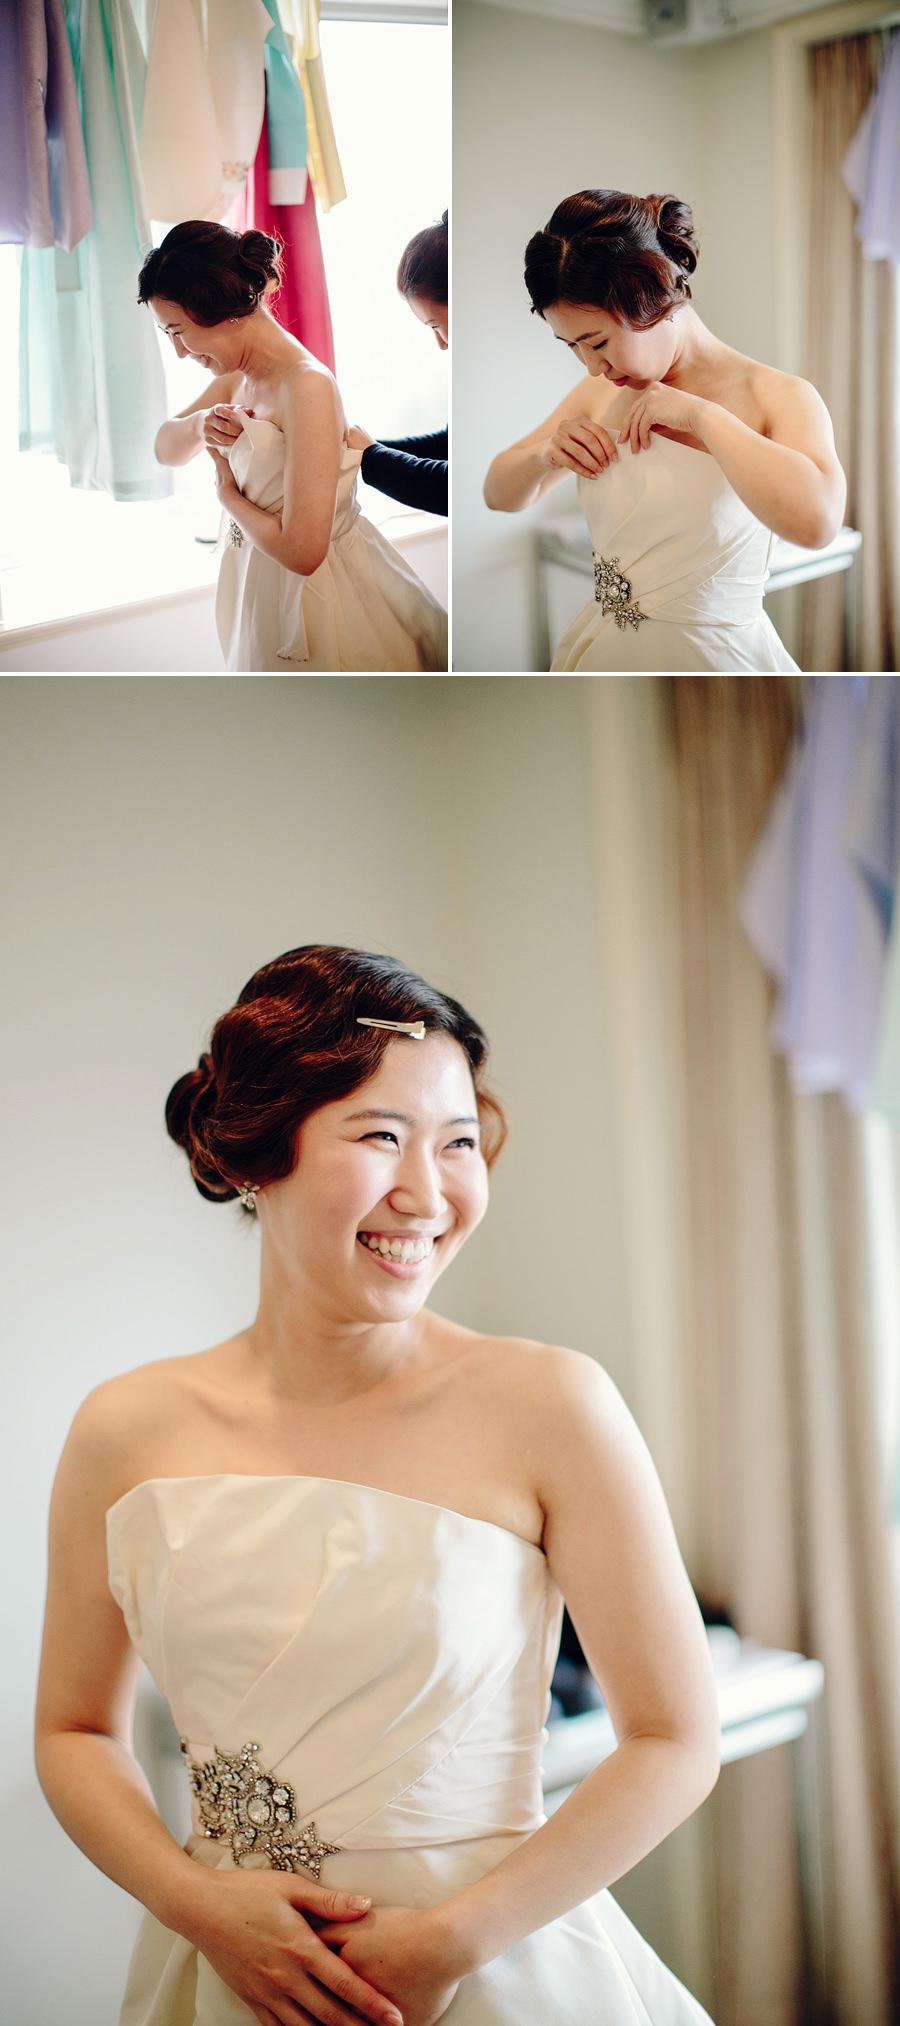 Sydney Wedding Photojournalist: Bride getting dressed